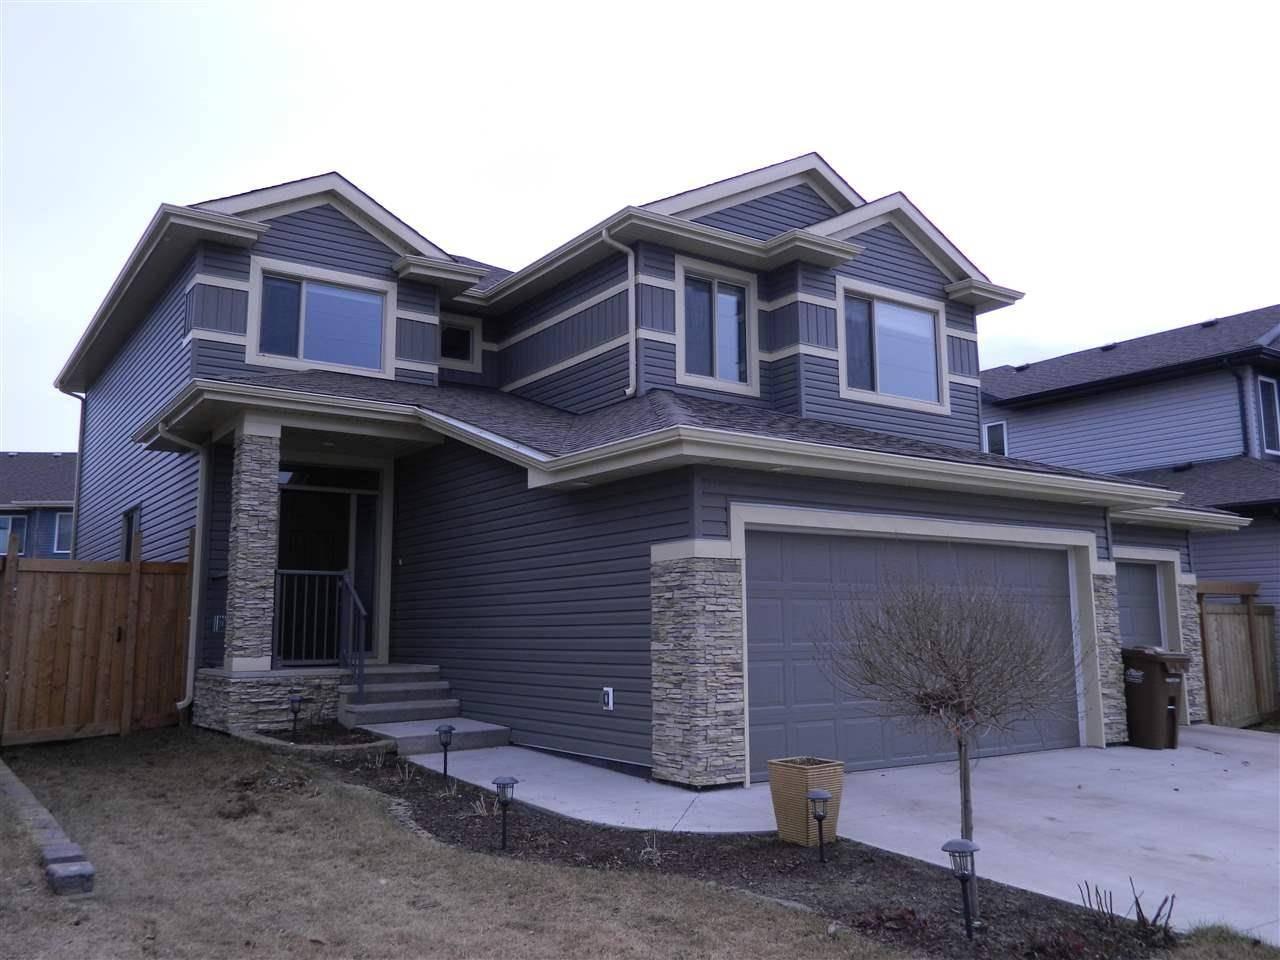 House for sale at 36 Nault Cres St. Albert Alberta - MLS: E4193528